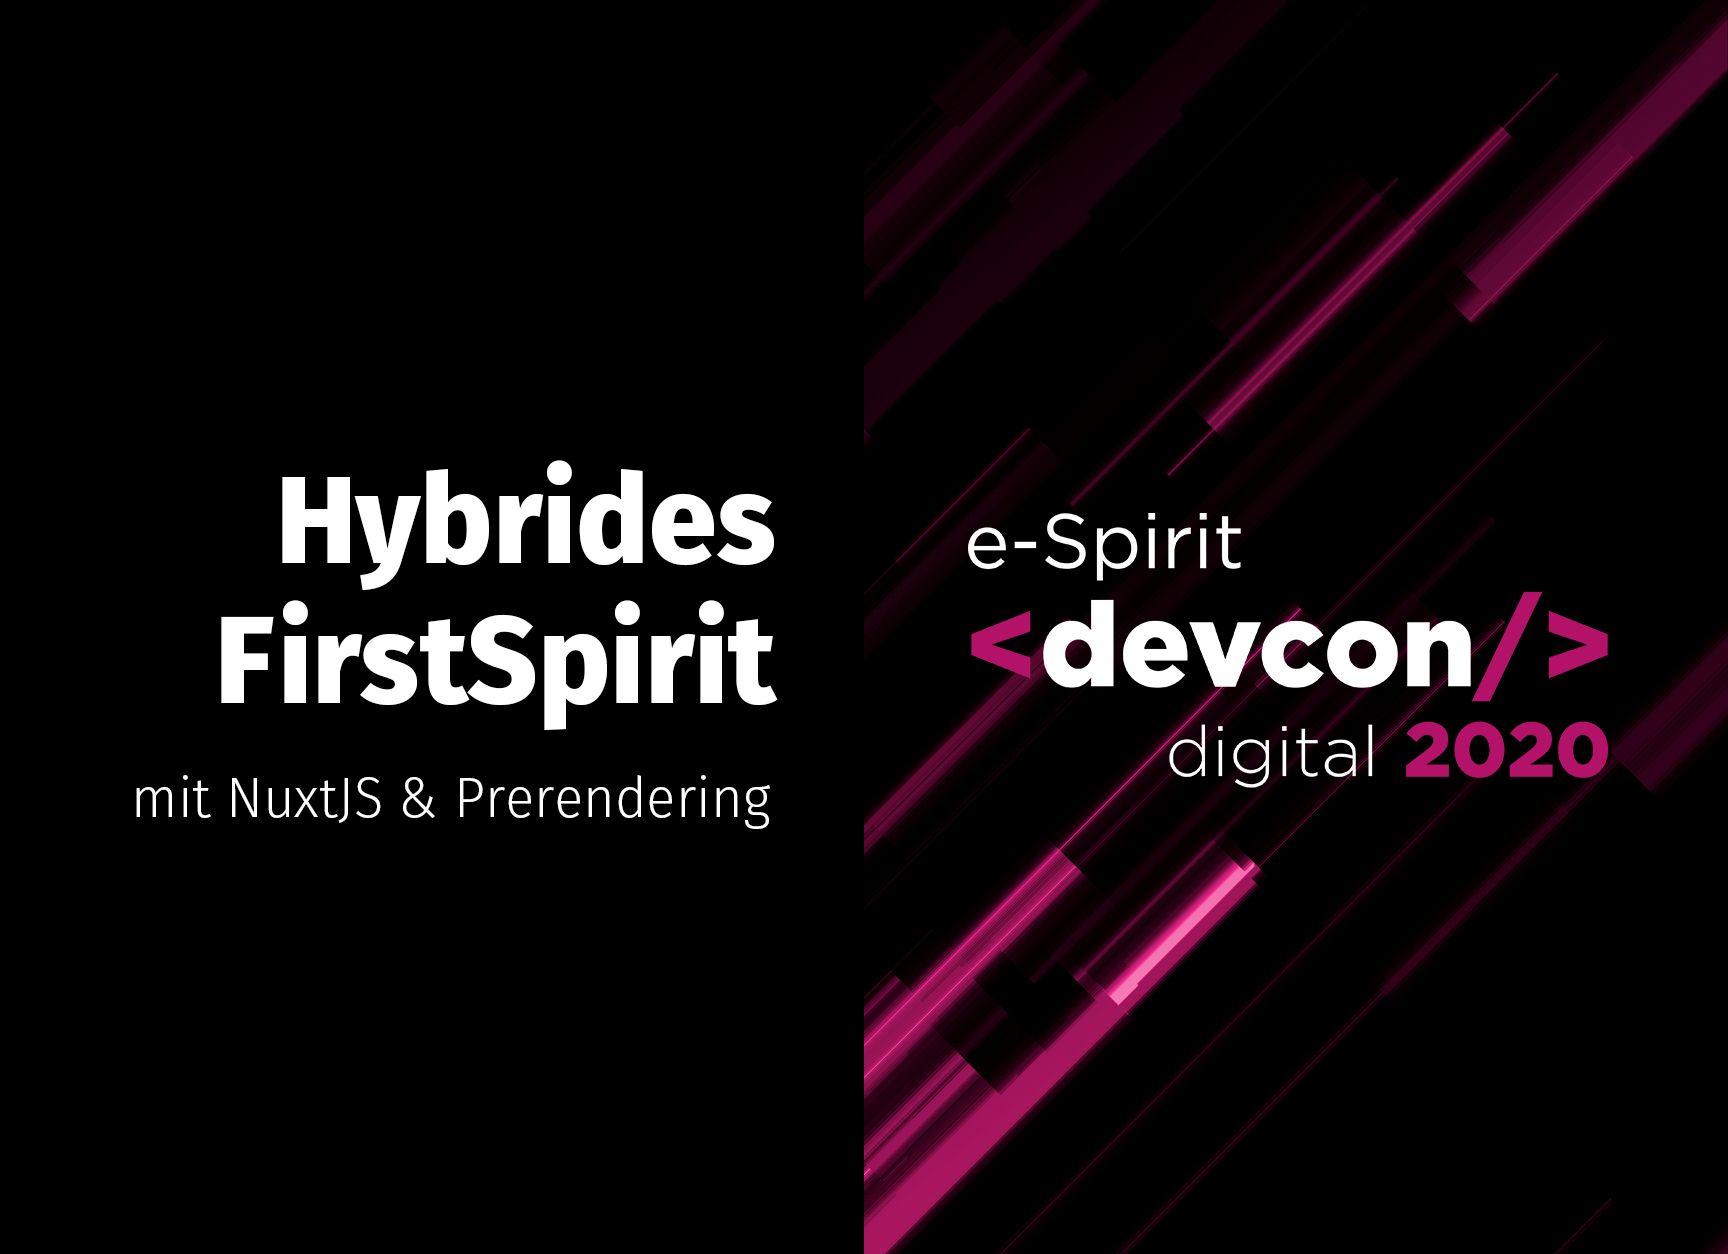 e-Spirit devcon digital 2020: Recap